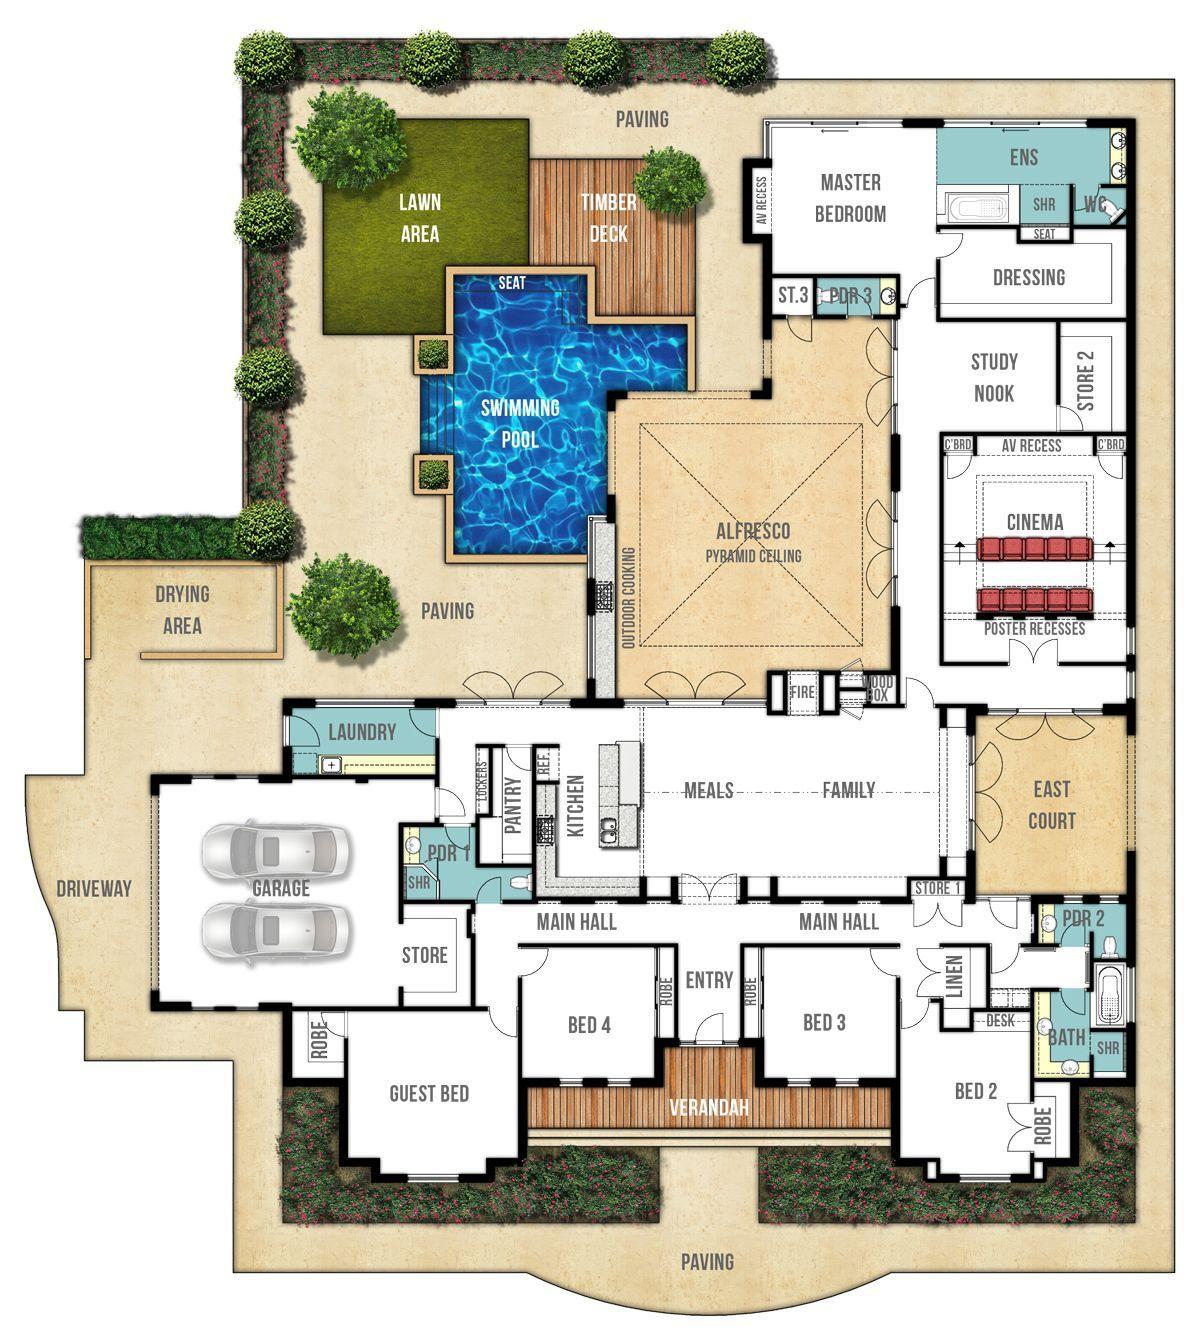 10 Best Modern Farmhouse Floor Plans That Won People Choice Award Farmhouse Floorplans Tags F Farmhouse Floor Plans Country House Design Dream House Plans